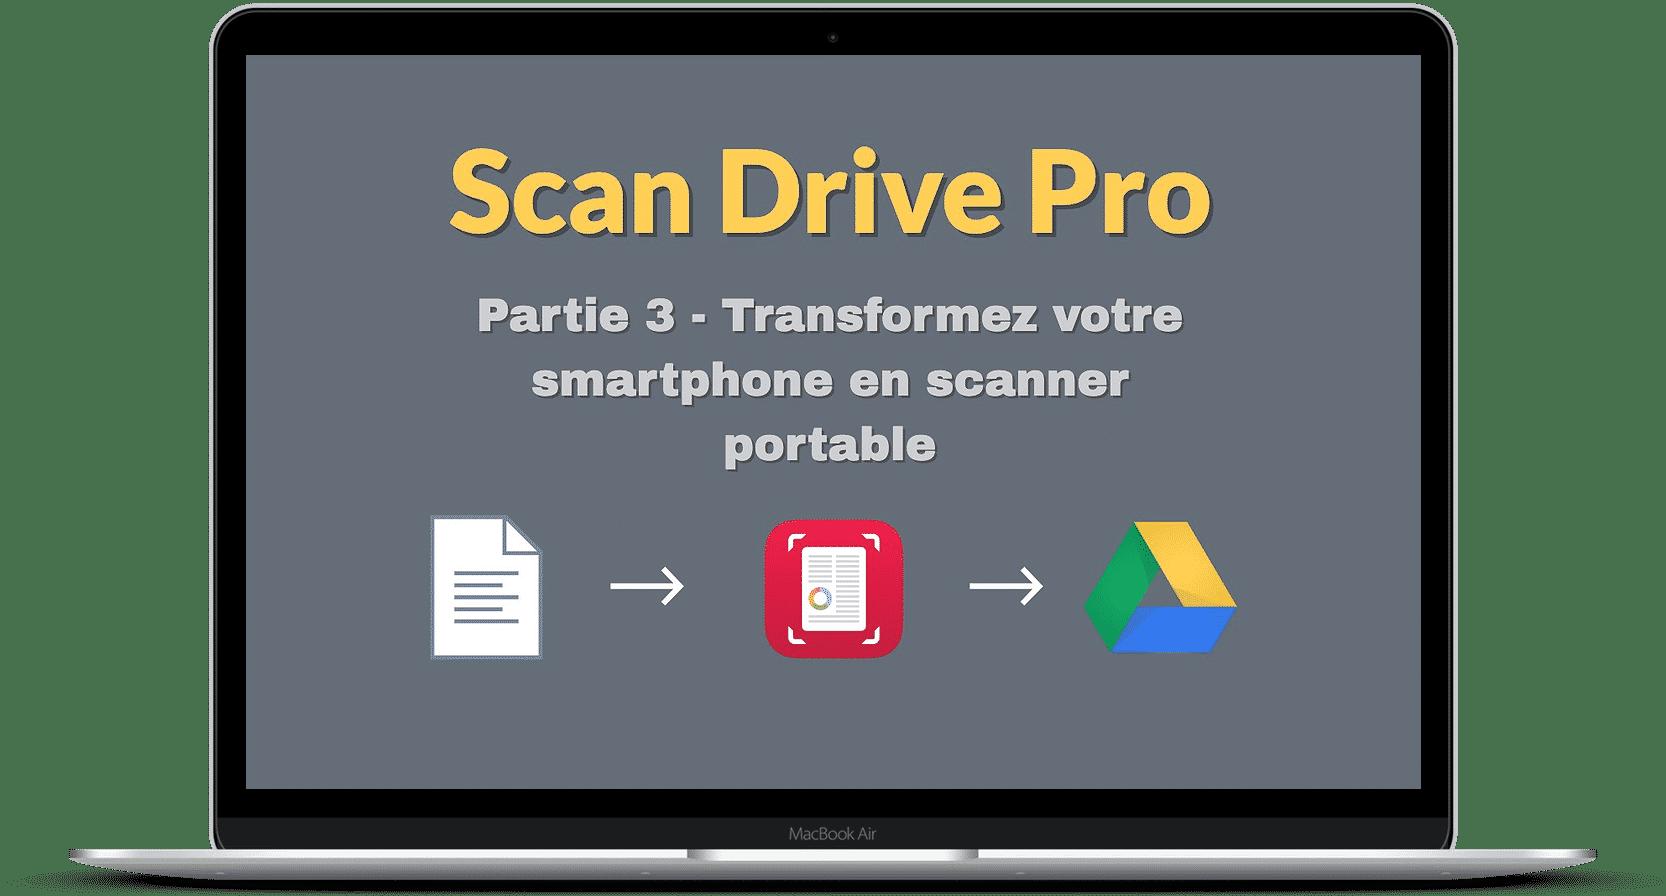 Scan Drive pro 3